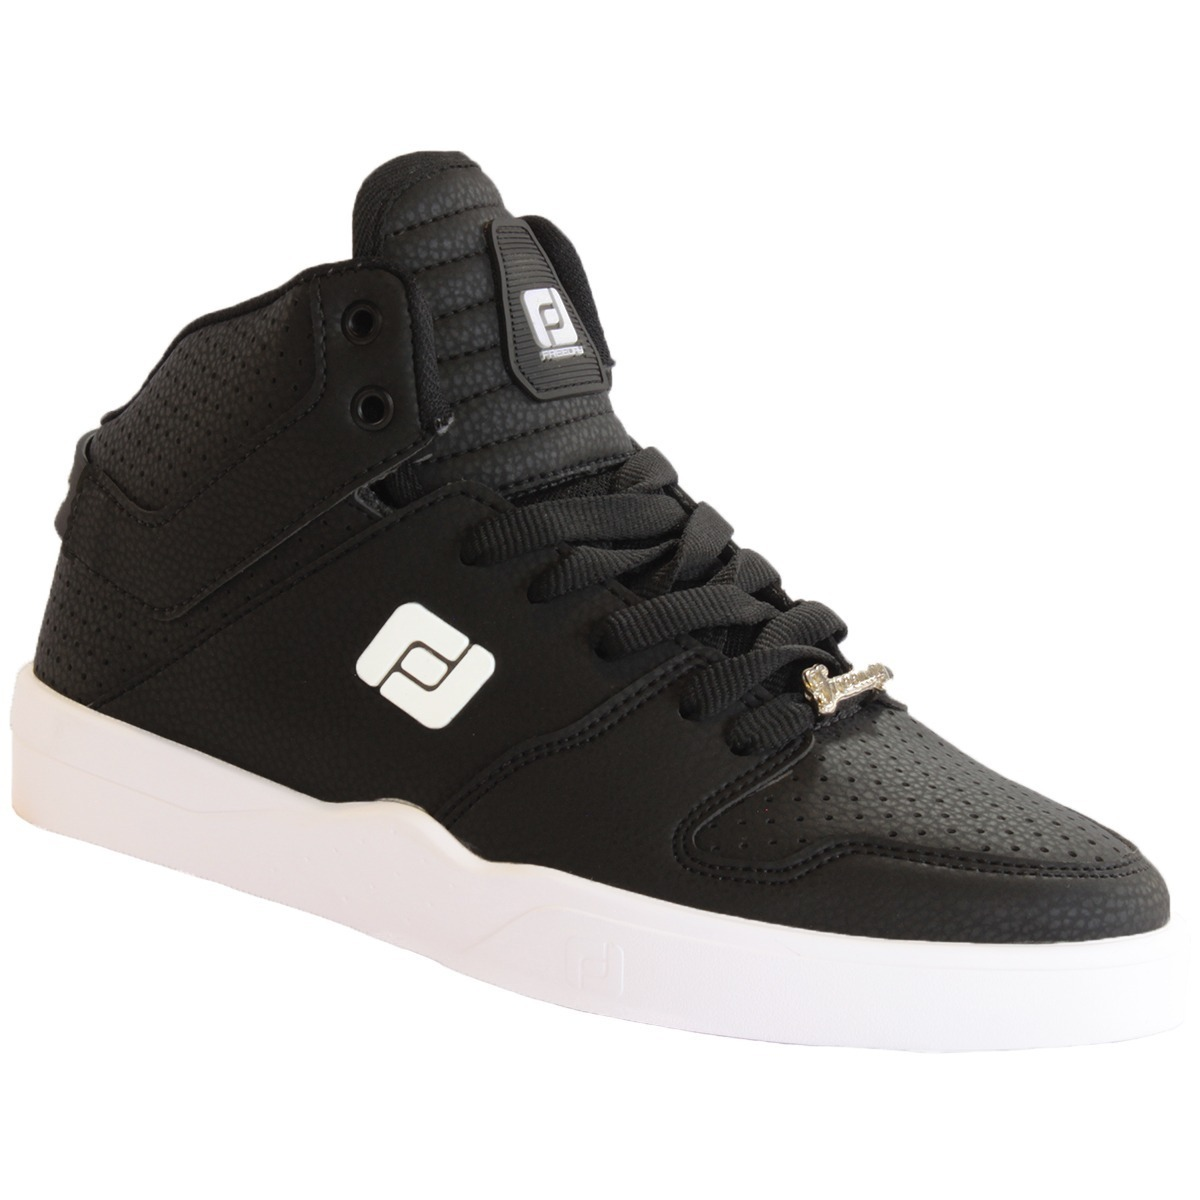 5c81f908165 tenis freeday skate steel hi top sneaker cano alto original. Carregando  zoom.